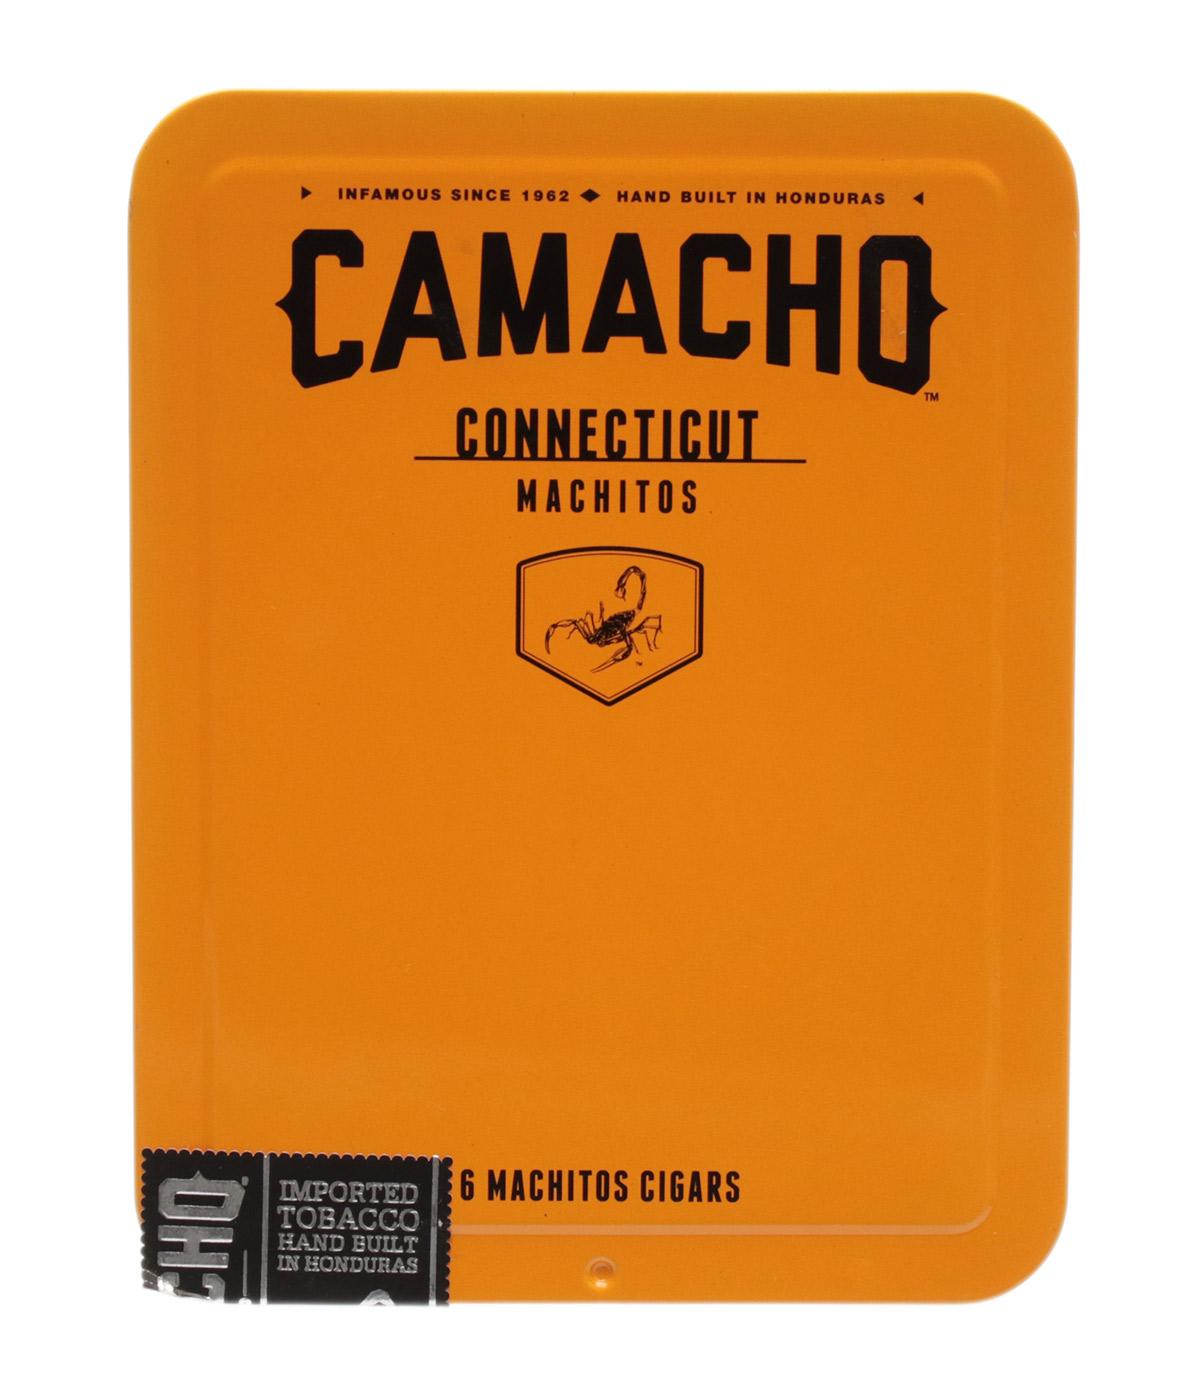 Camacho Connecticut Machitos